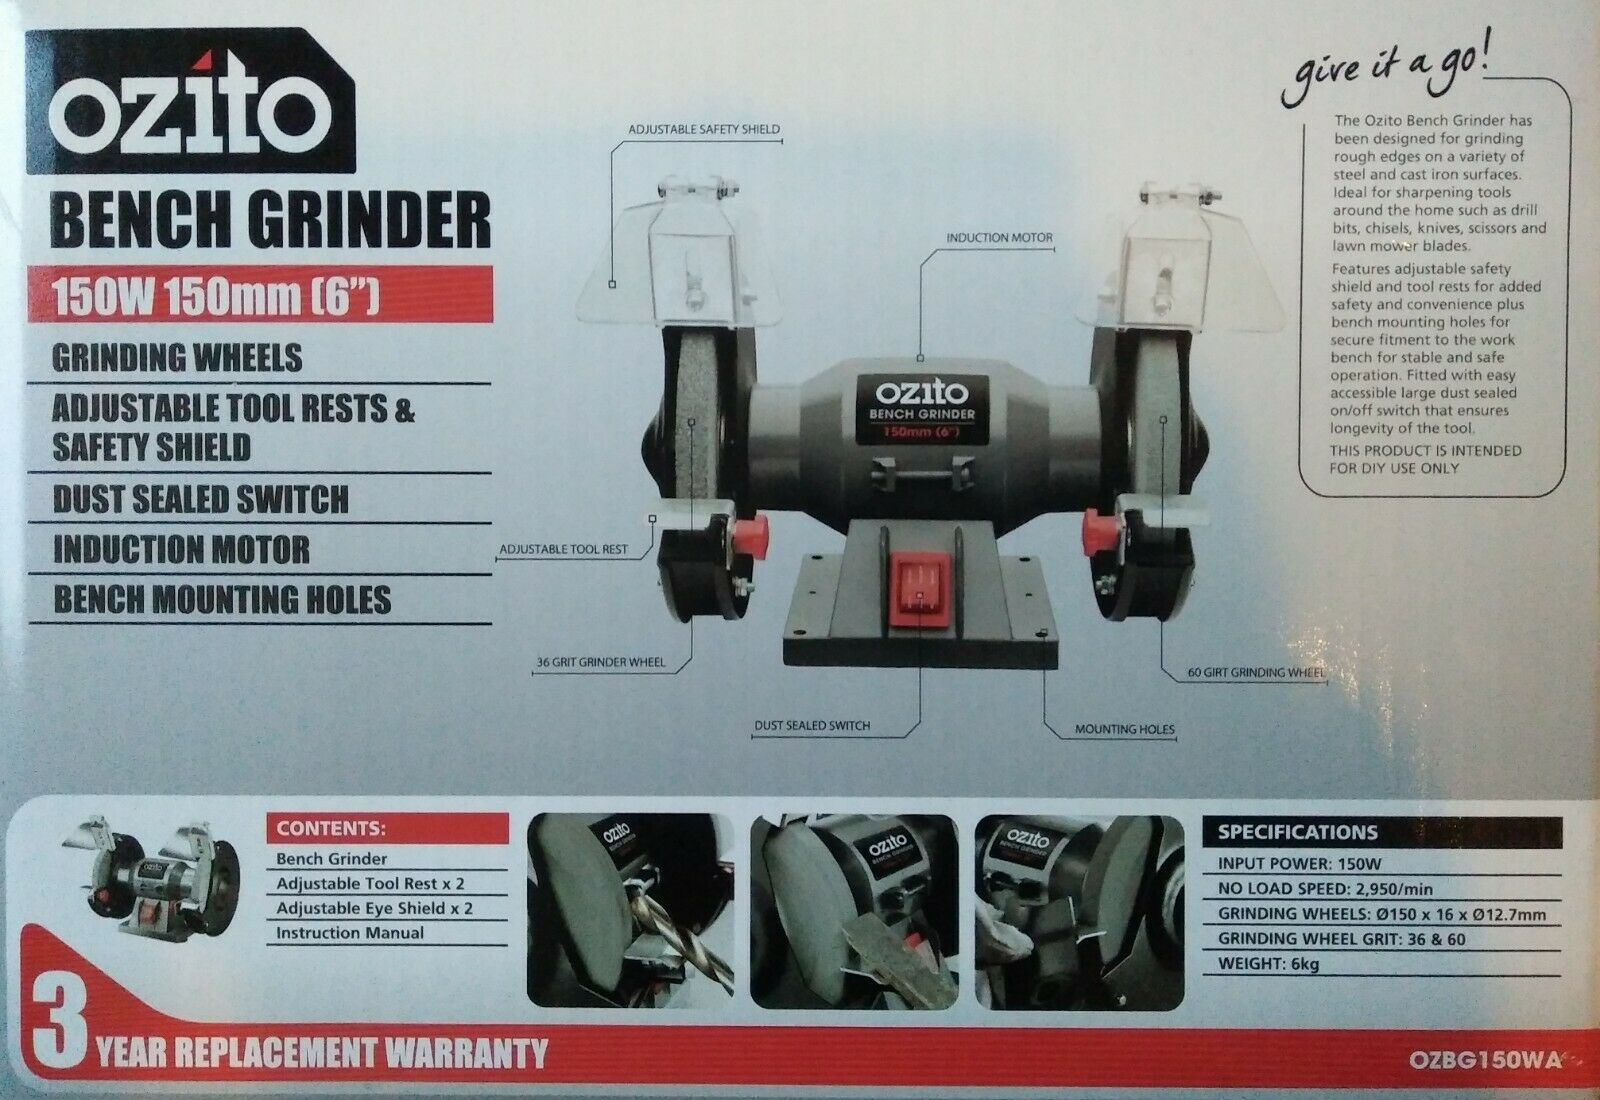 Pleasing Details About Ozito 150Mm 6 Bench Grinder 150W Induction Motor Adjustable Eye Safe Shields Short Links Chair Design For Home Short Linksinfo